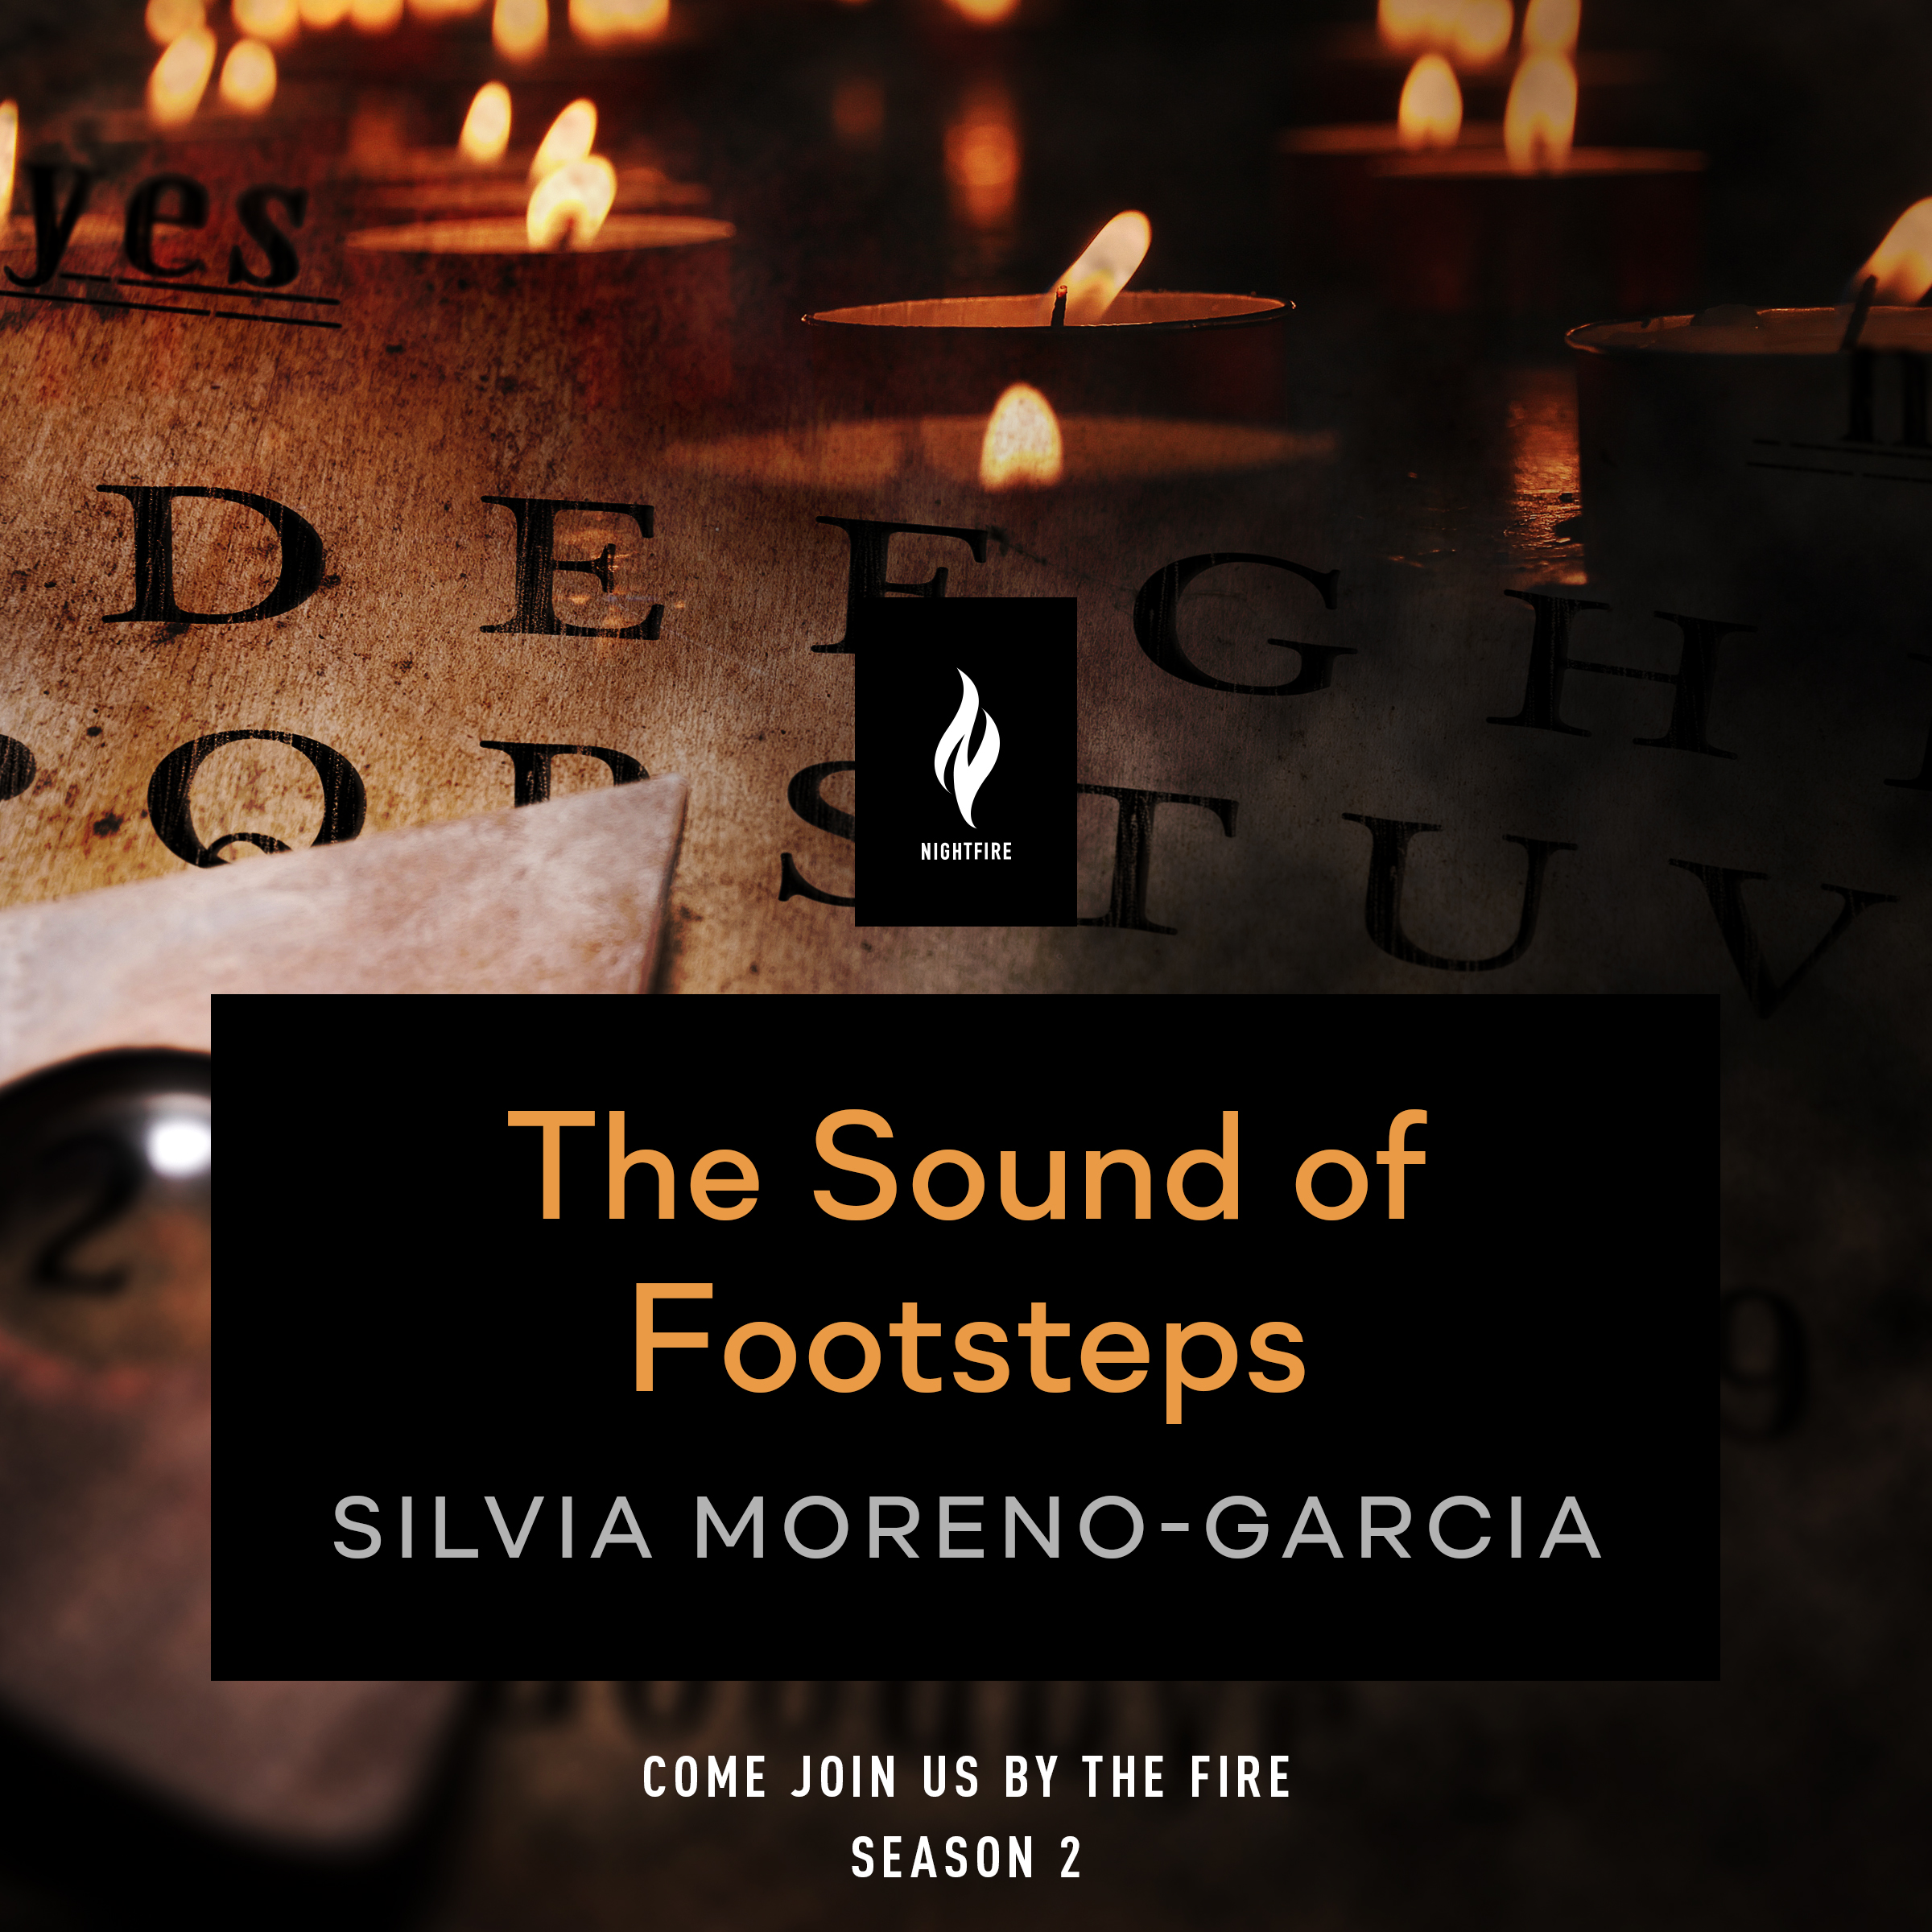 SoundofFootsteps_Moreno-Garcia